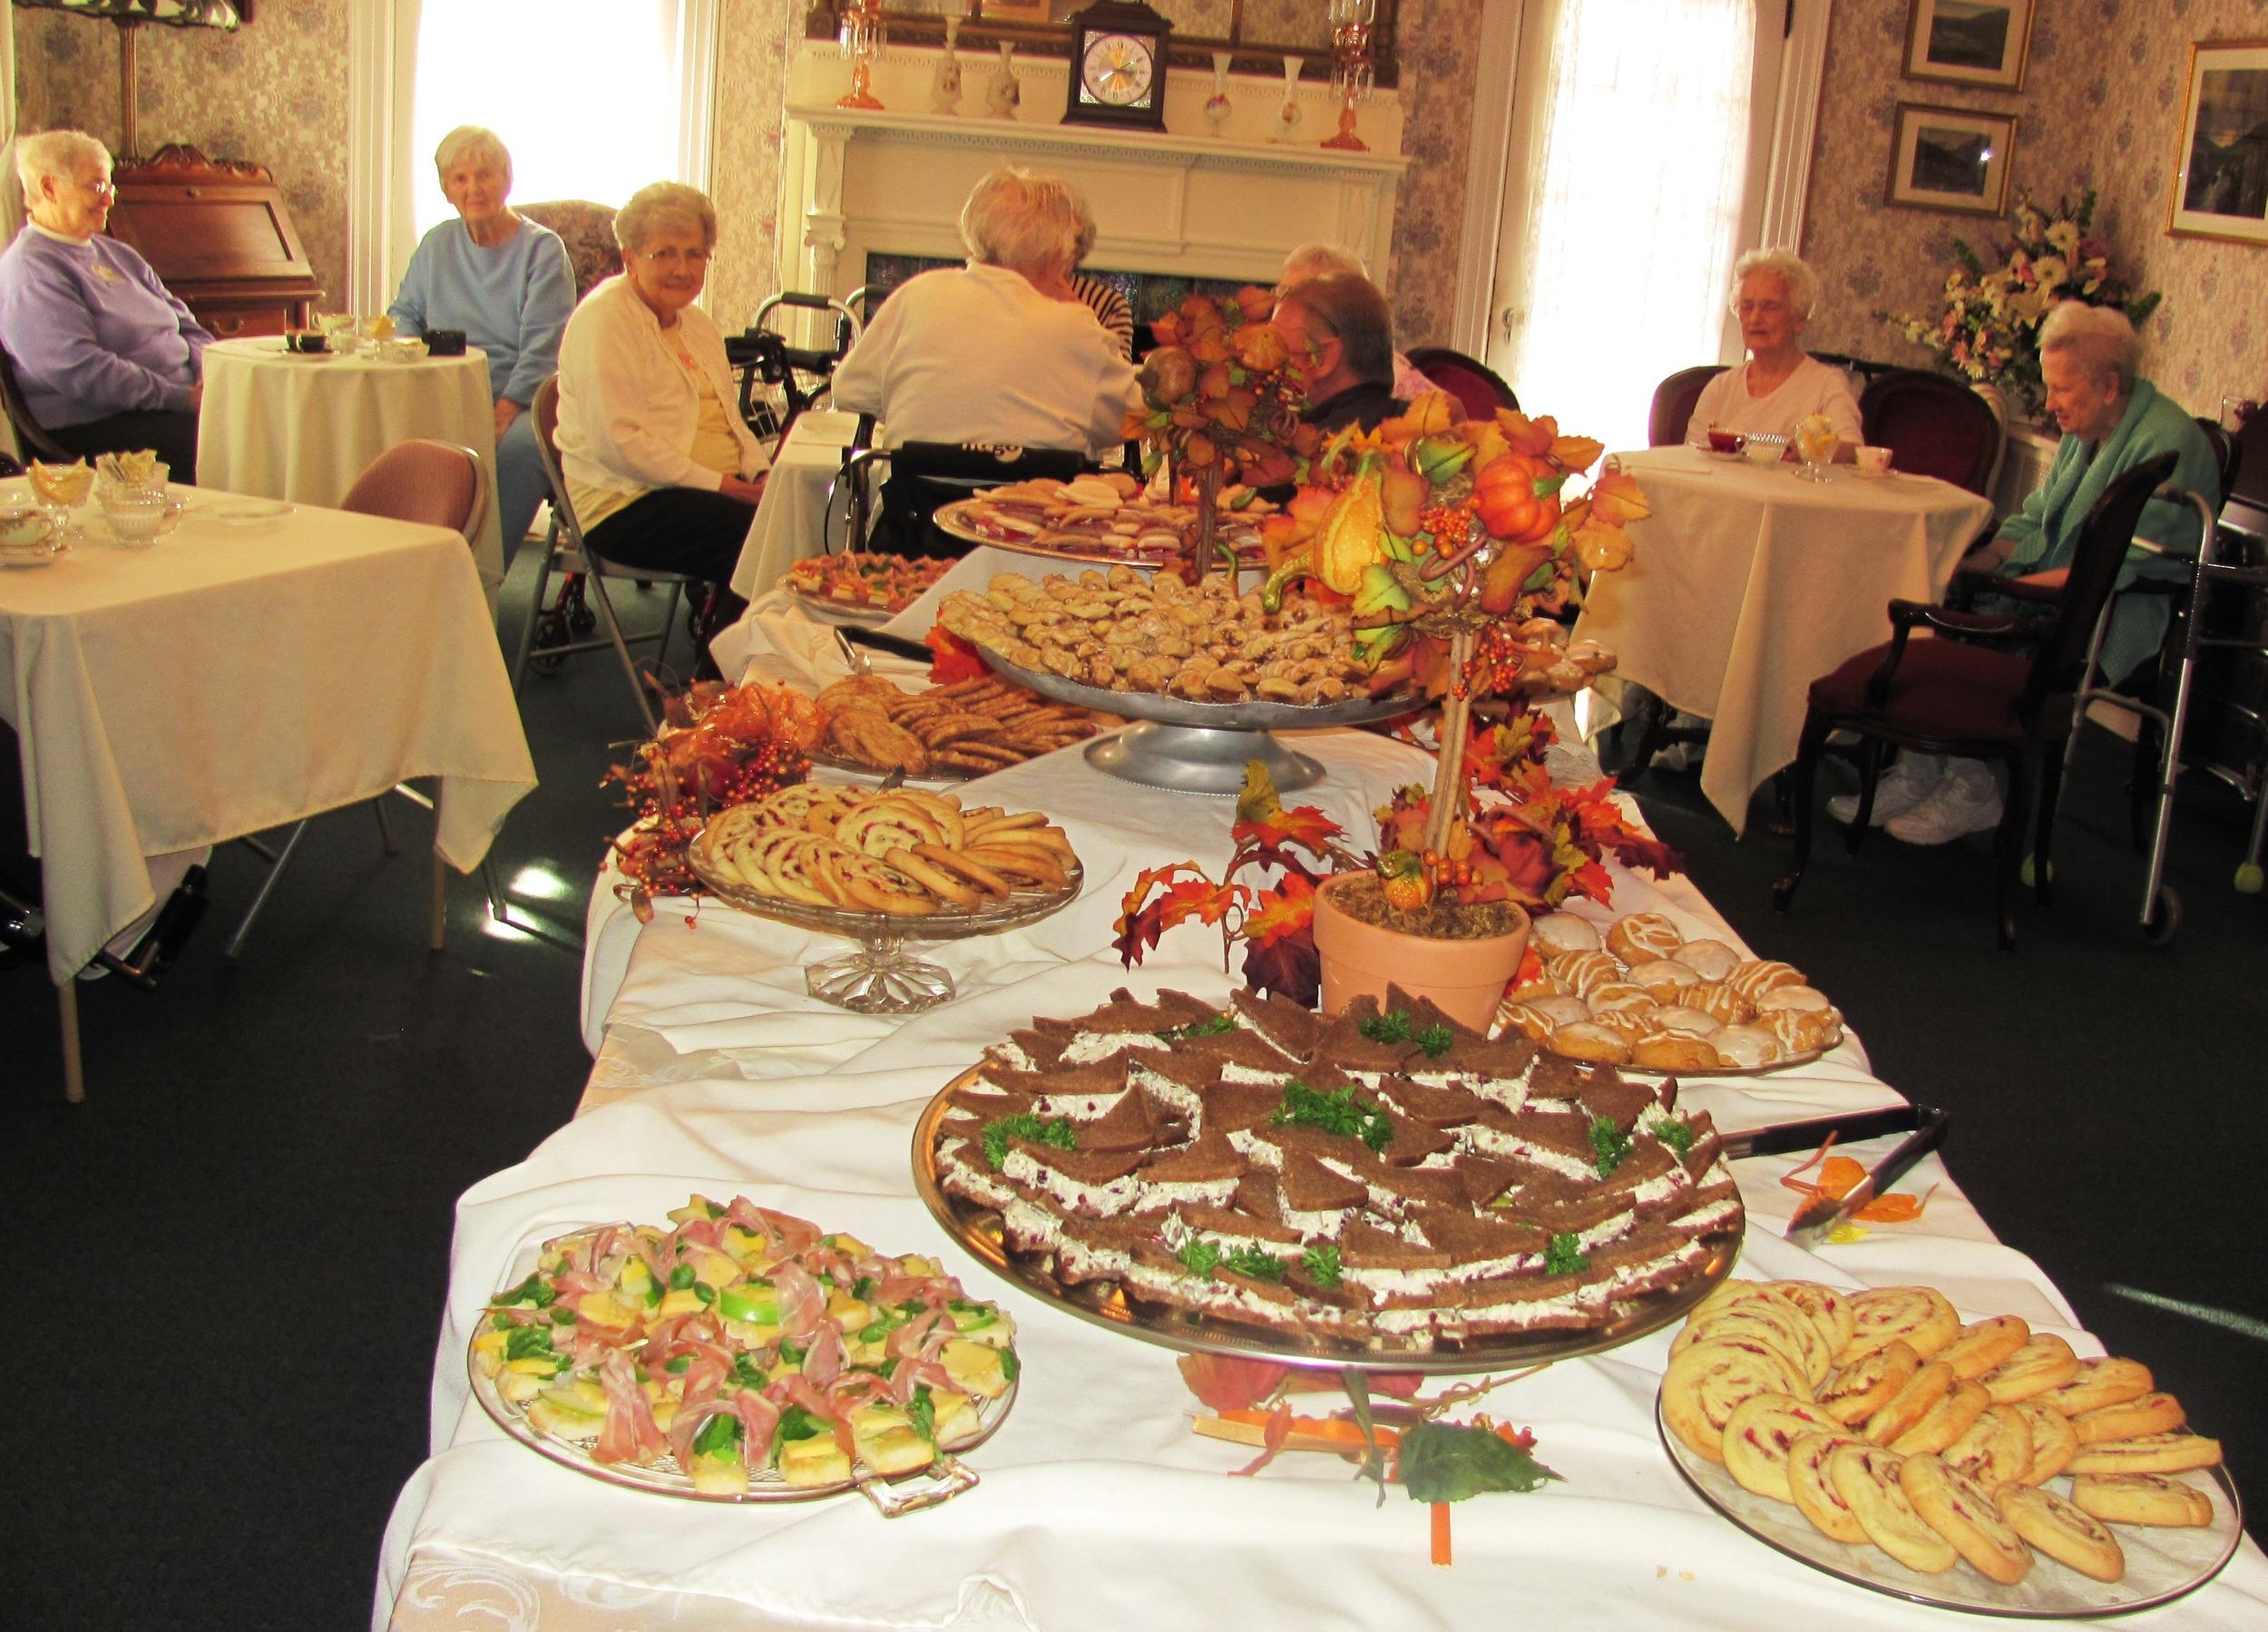 Food_Table_and_Room.jpg